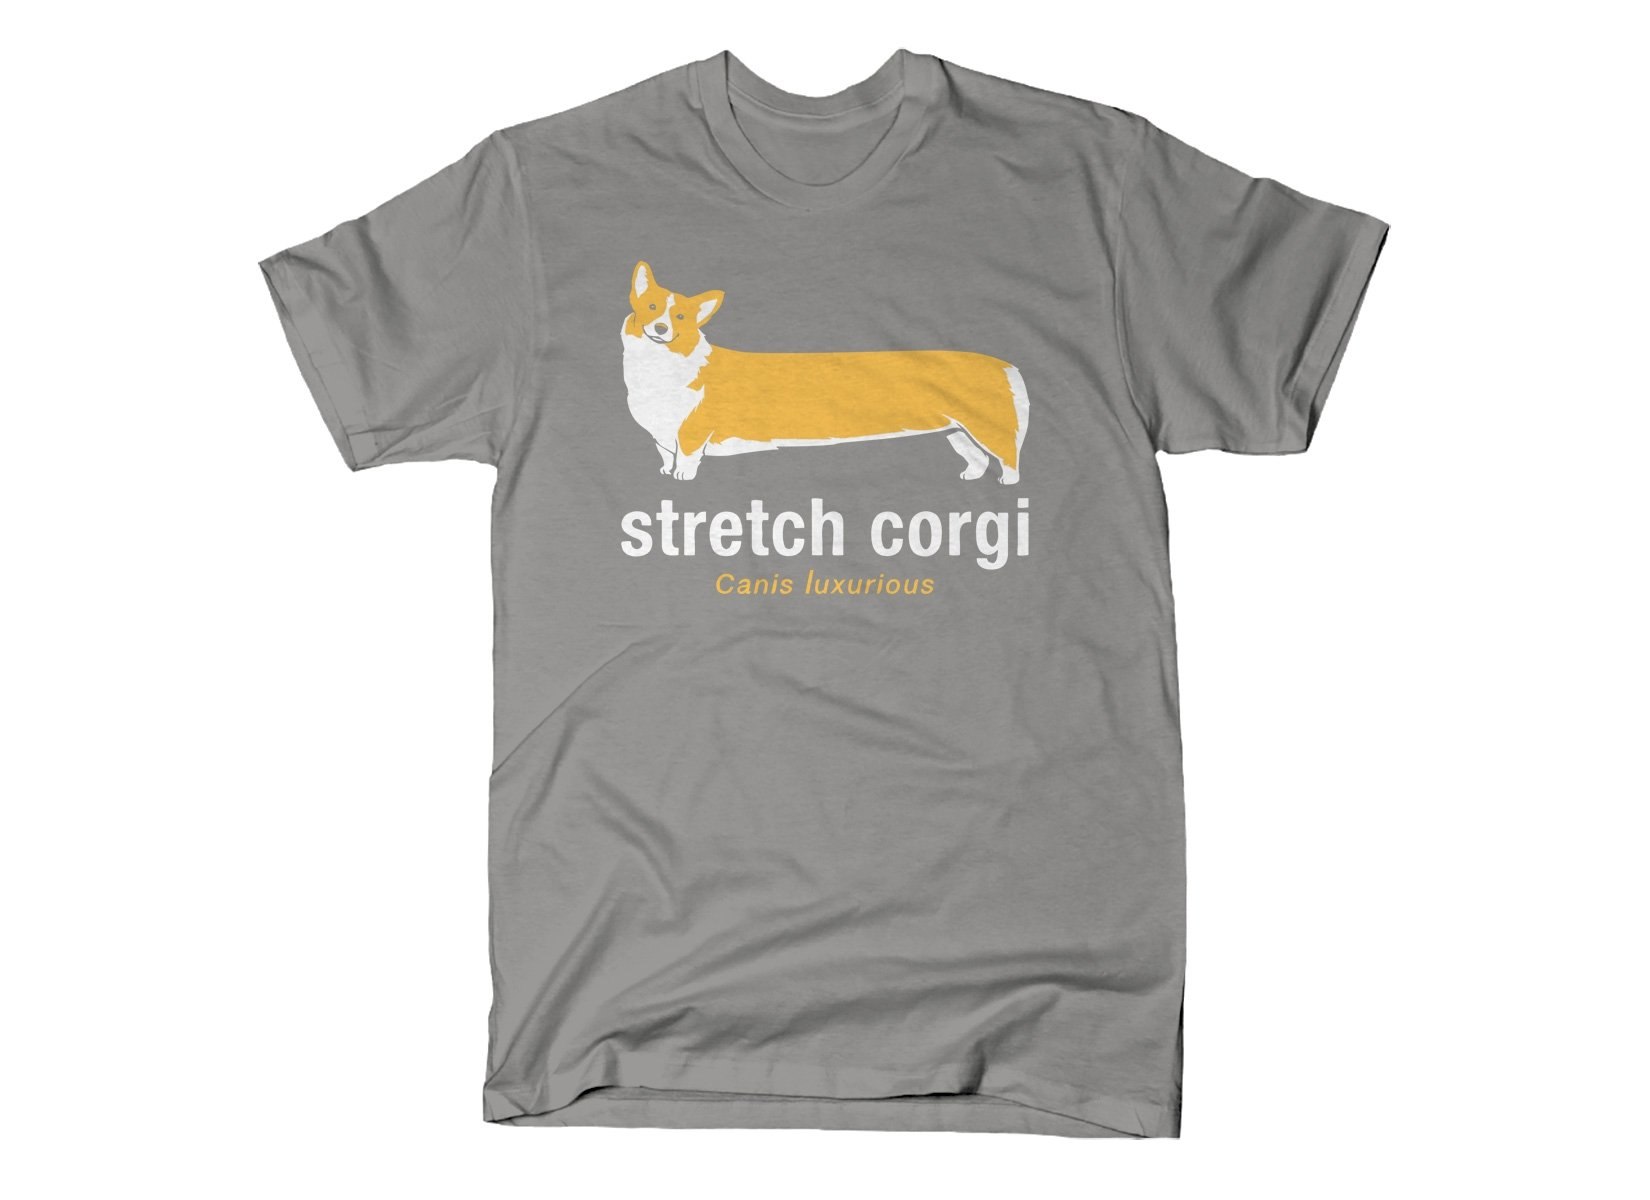 Stretch Corgi on Mens T-Shirt